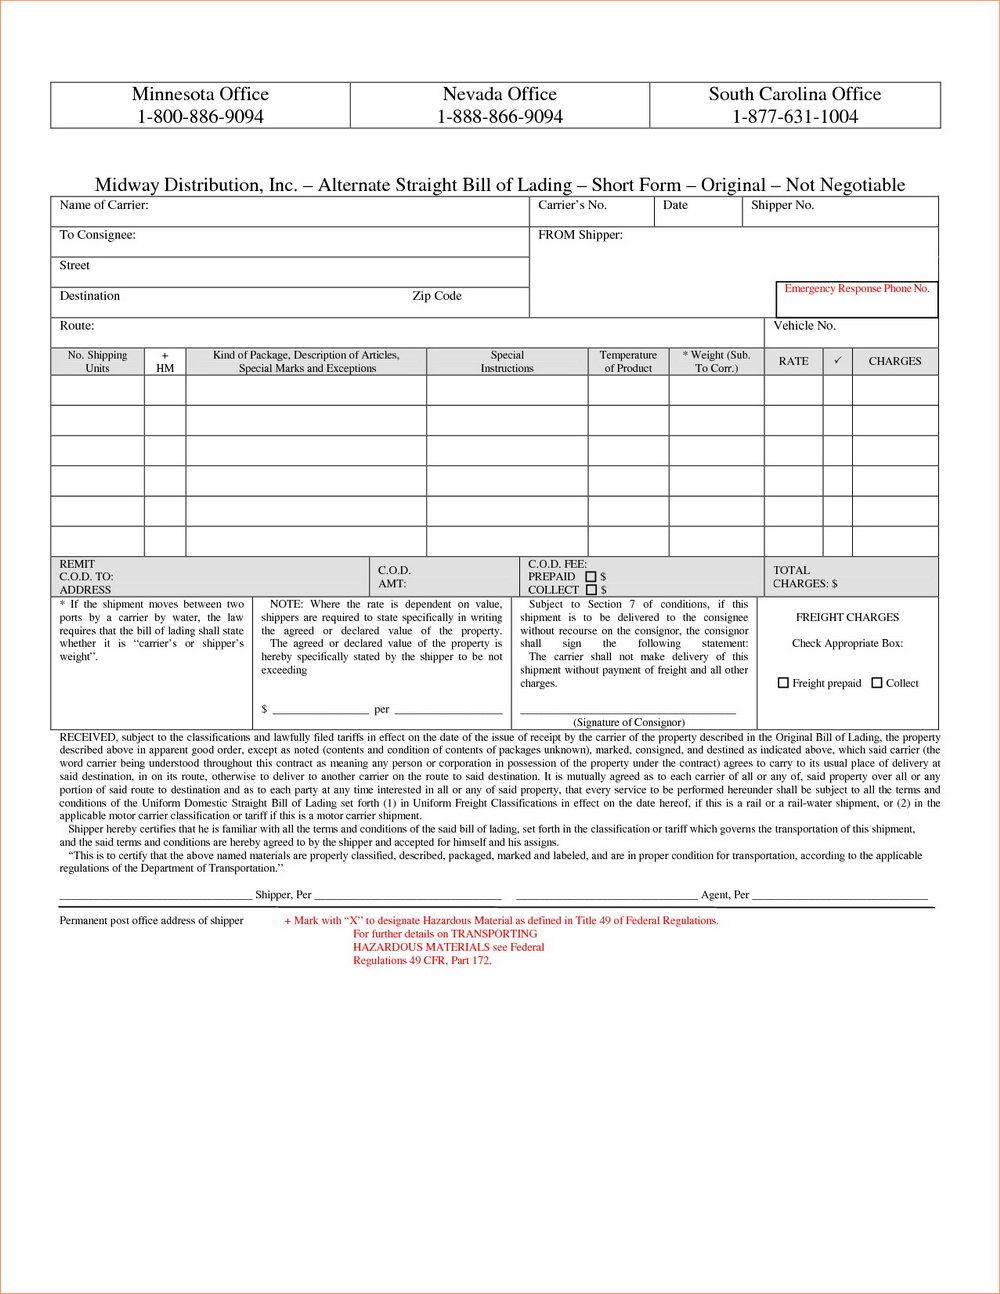 Straight Bill Of Lading Short Form Template